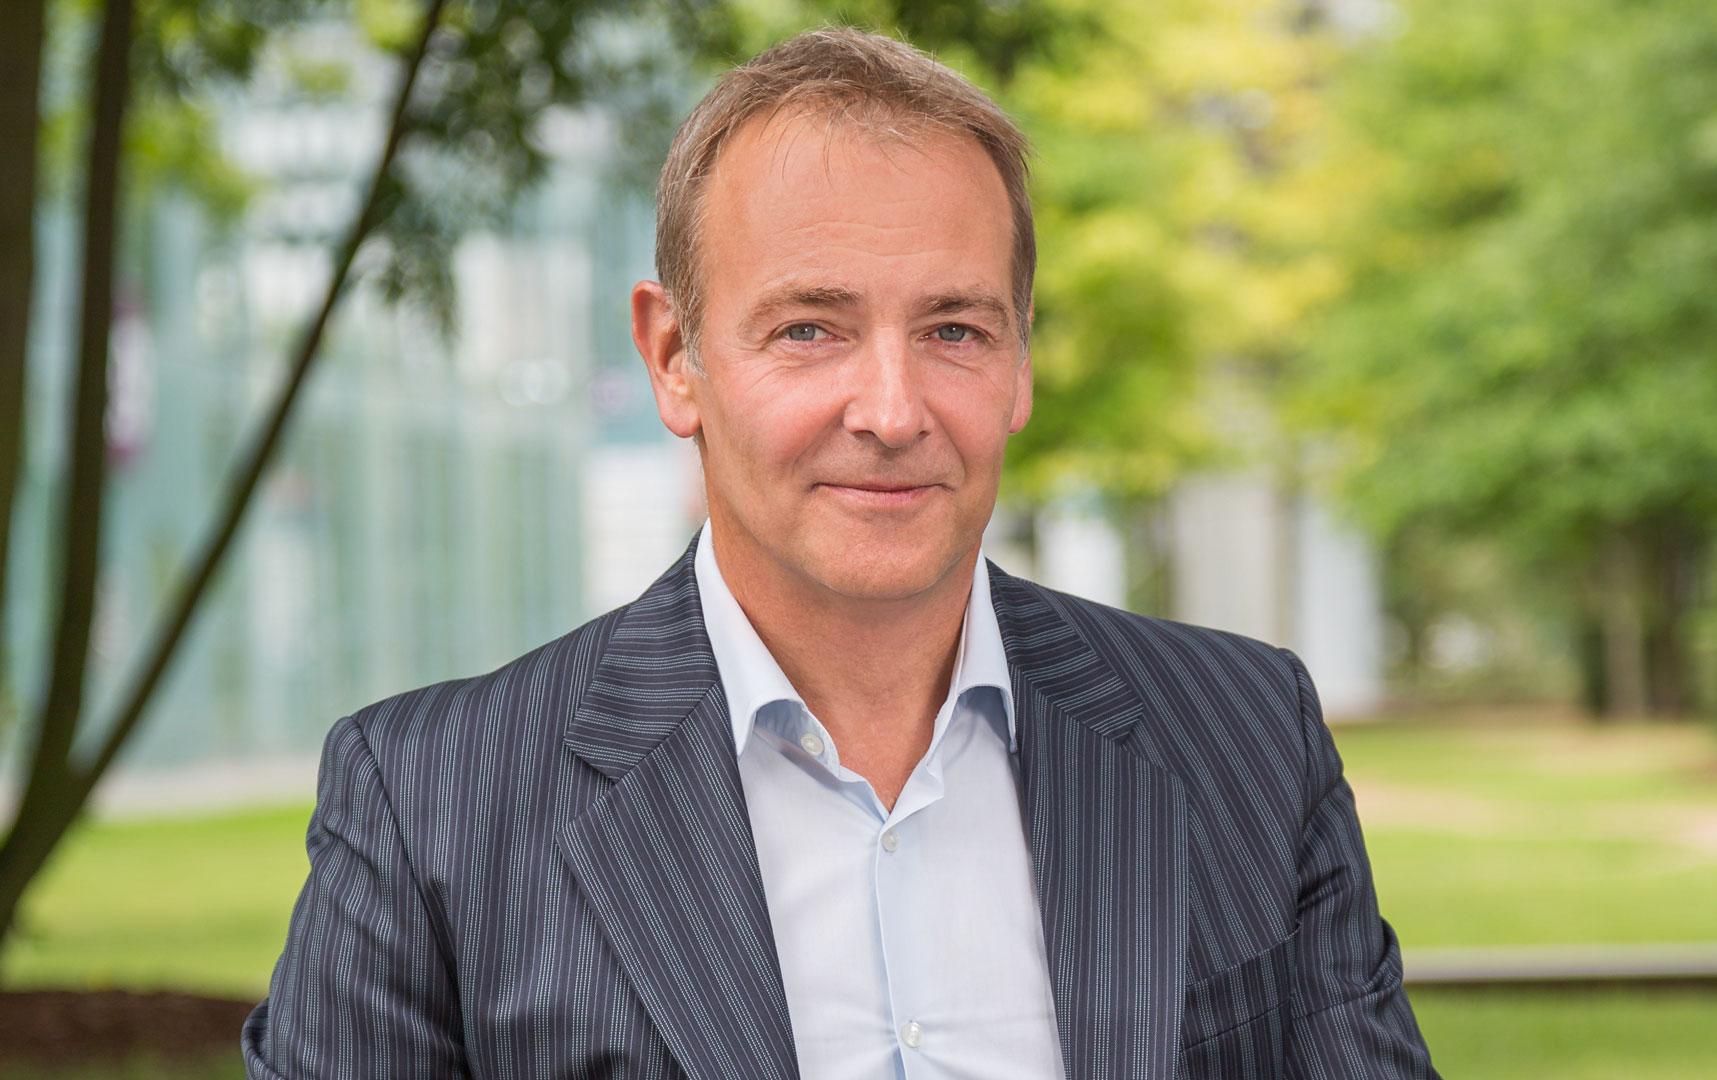 Zahnarzt Coaching - Unternehmensberatung fuer Zahnarztpraxen